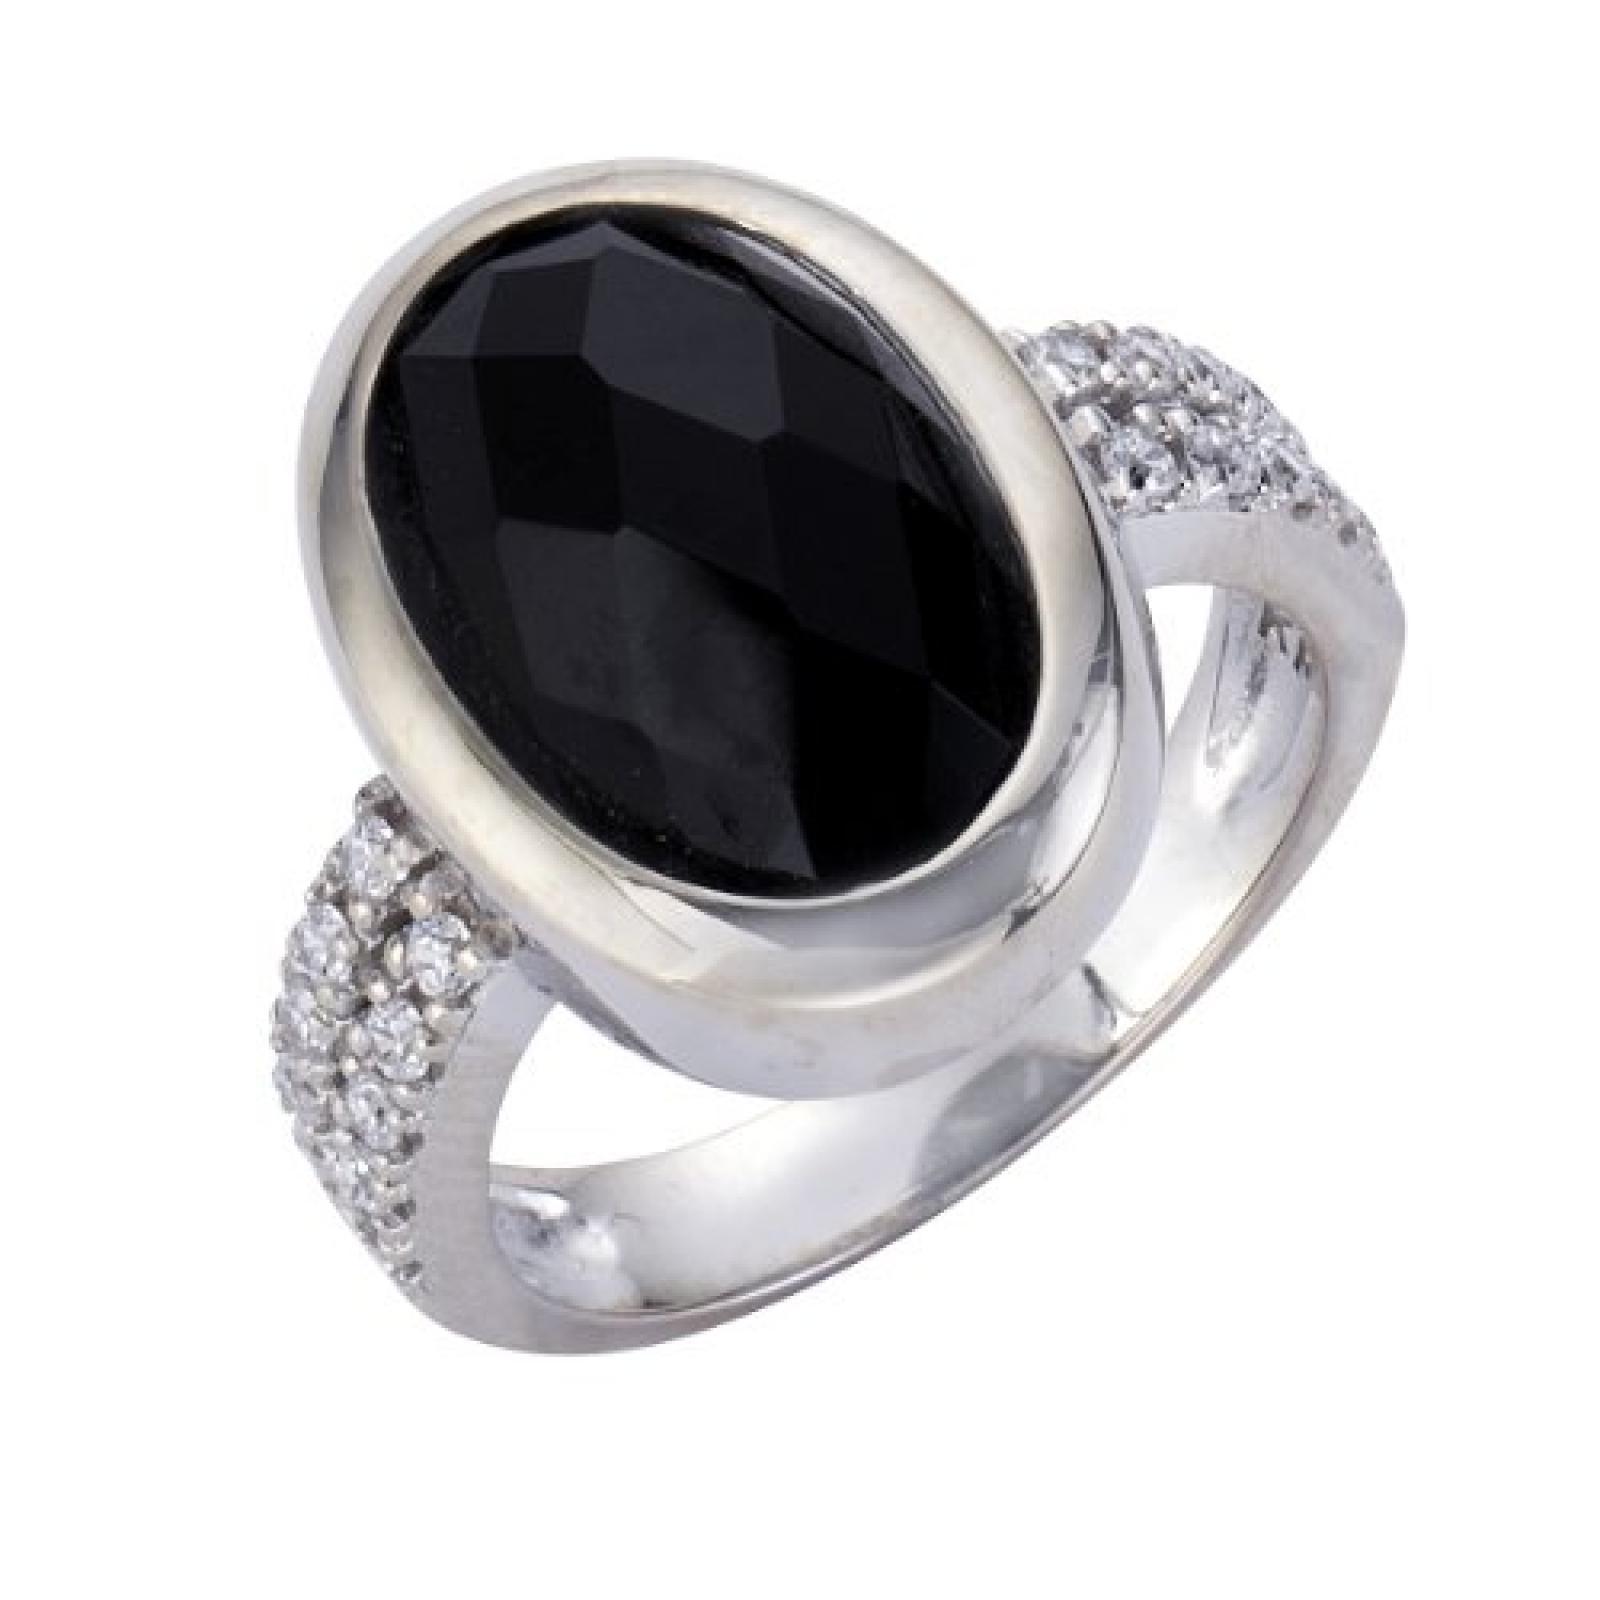 Celesta Damen-Ring 925 Sterling Silber Kristall schwarz + Zirkonia weiß Gr. 60 (19.1) 273270876-060